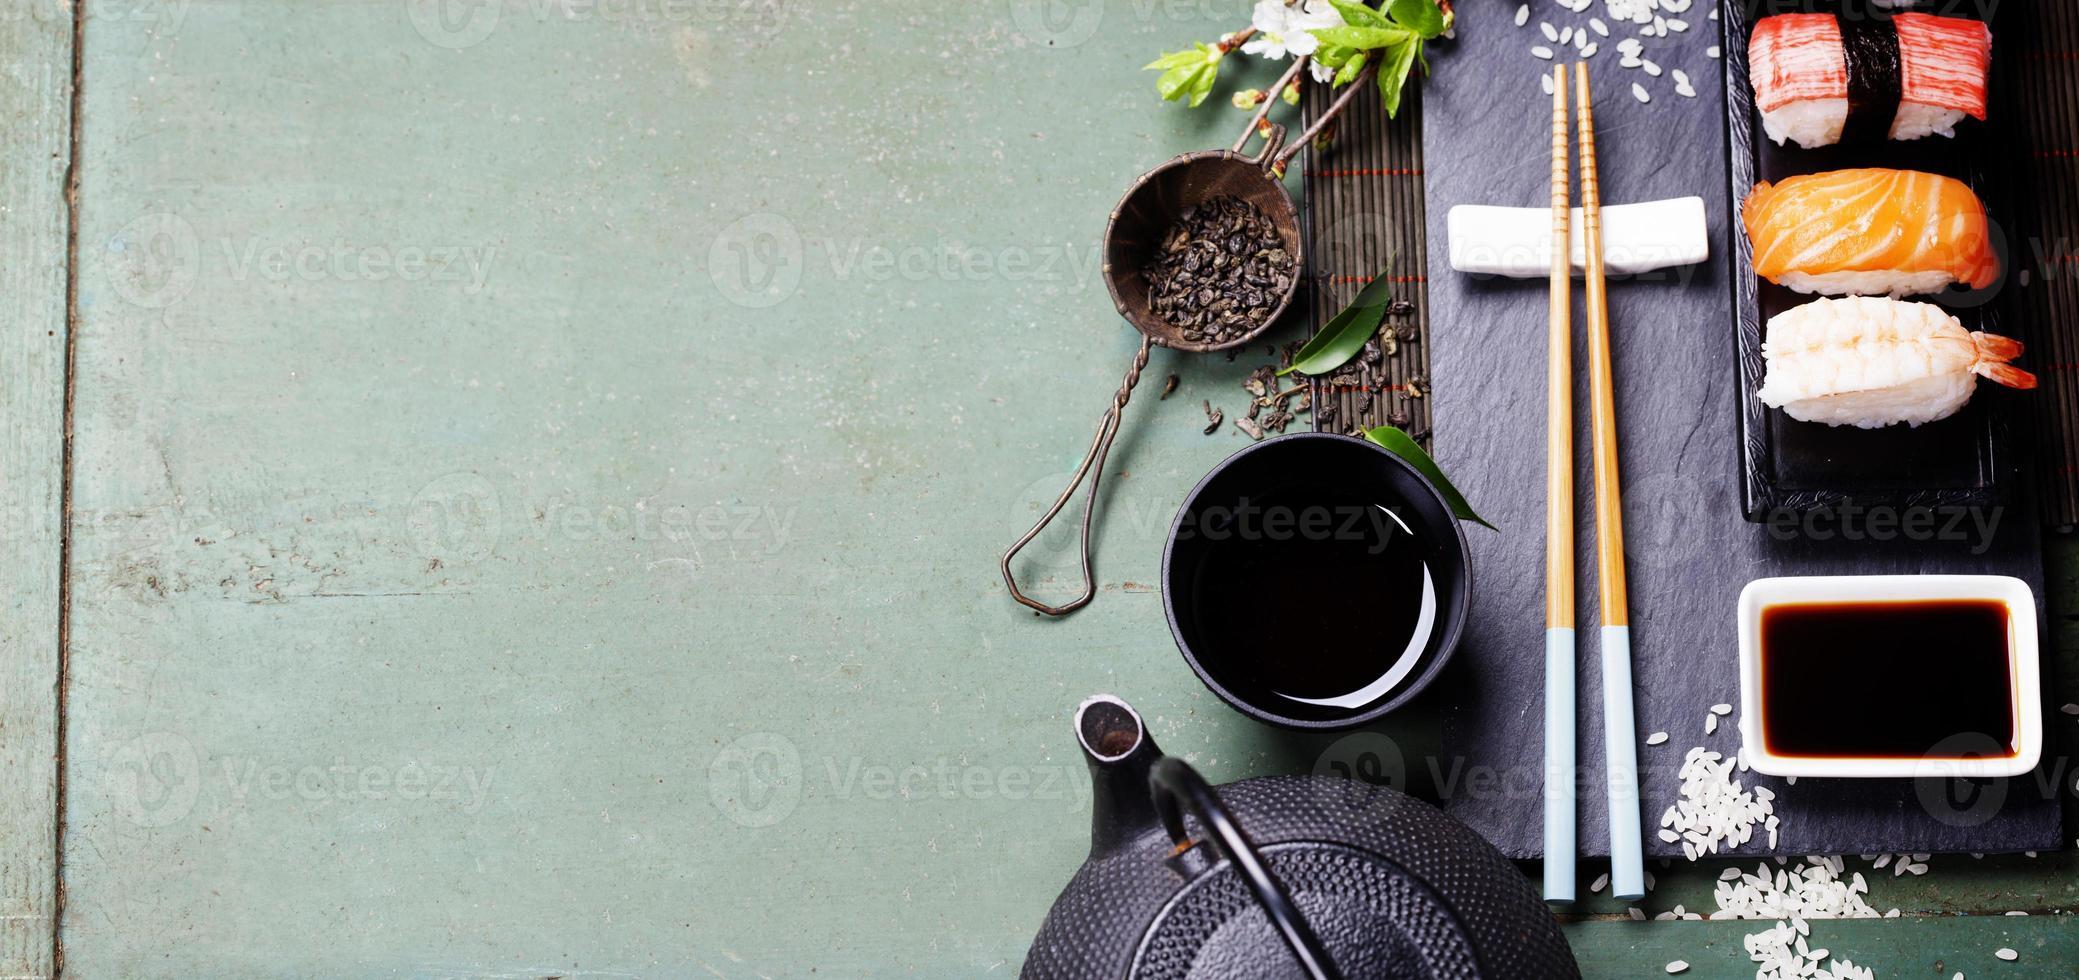 en japansk mat skrivbordsbakgrund foto